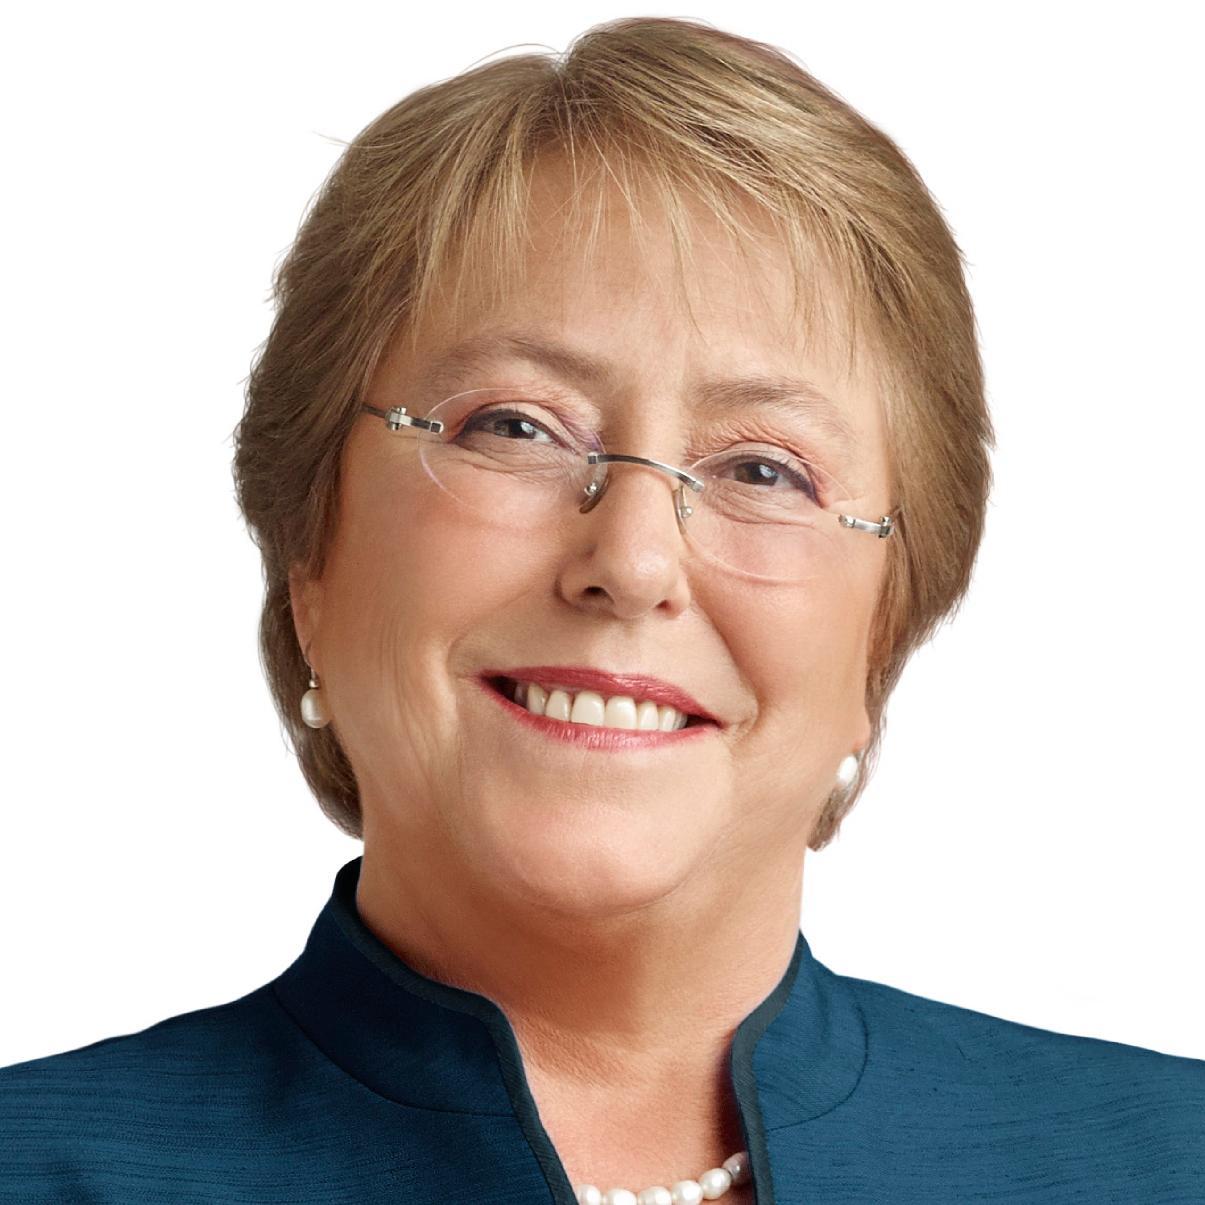 Elección Presidencial de Chile de 2013 (Un Camino Diferente)